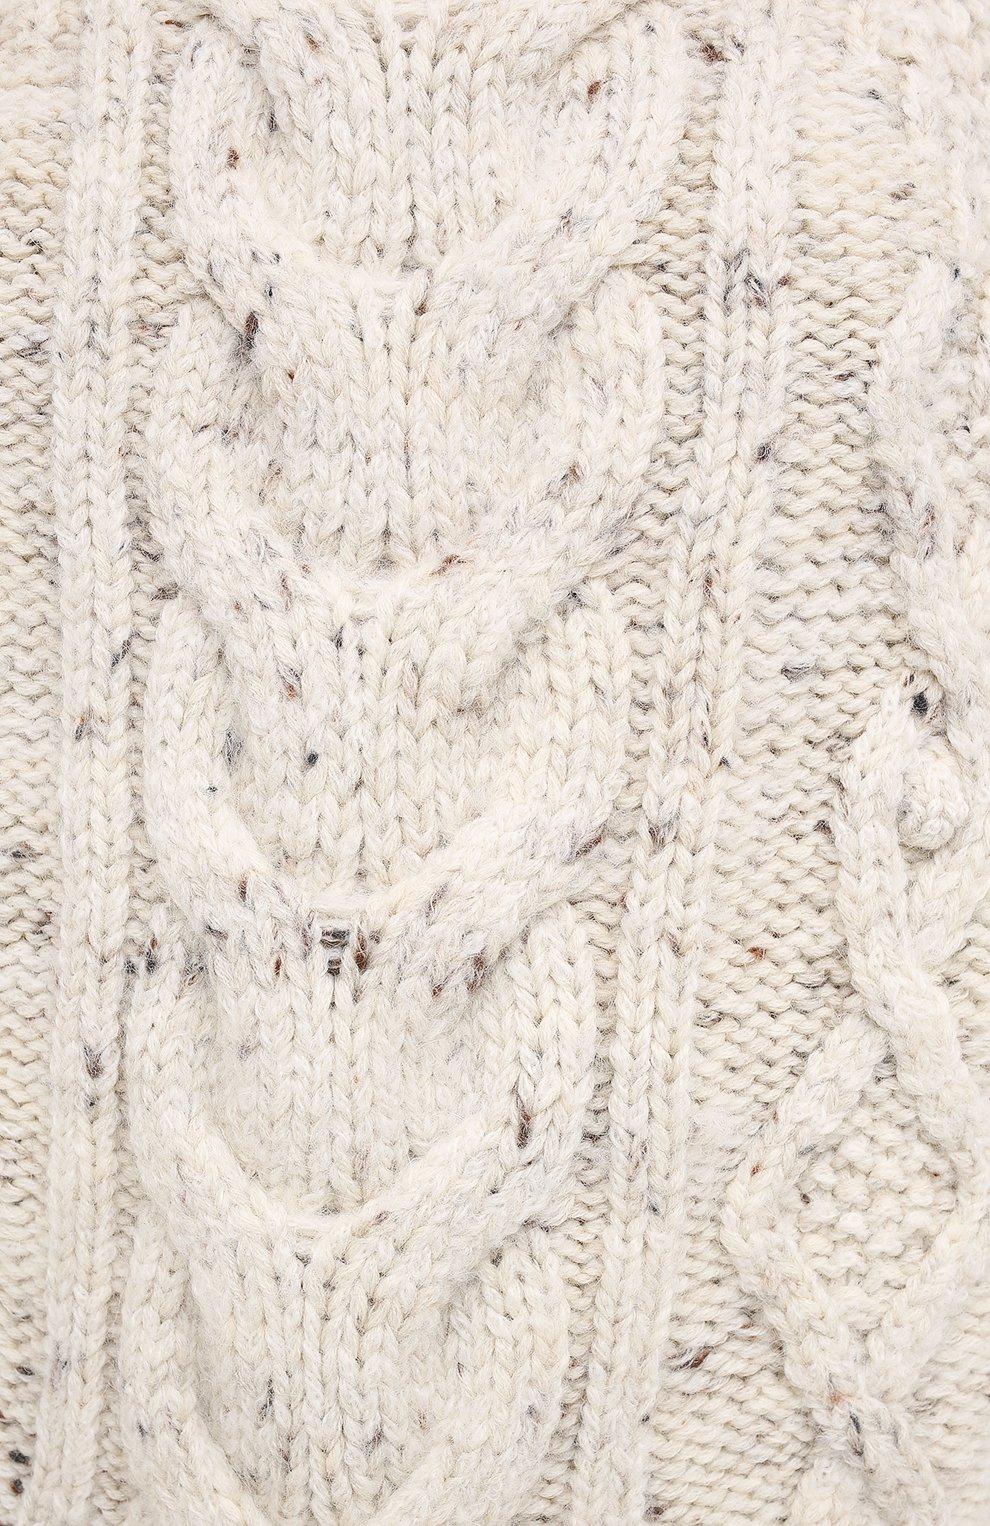 Женский шерстяной свитер ISABEL MARANT бежевого цвета, арт. PU1481-20H007I/FL0VER | Фото 5